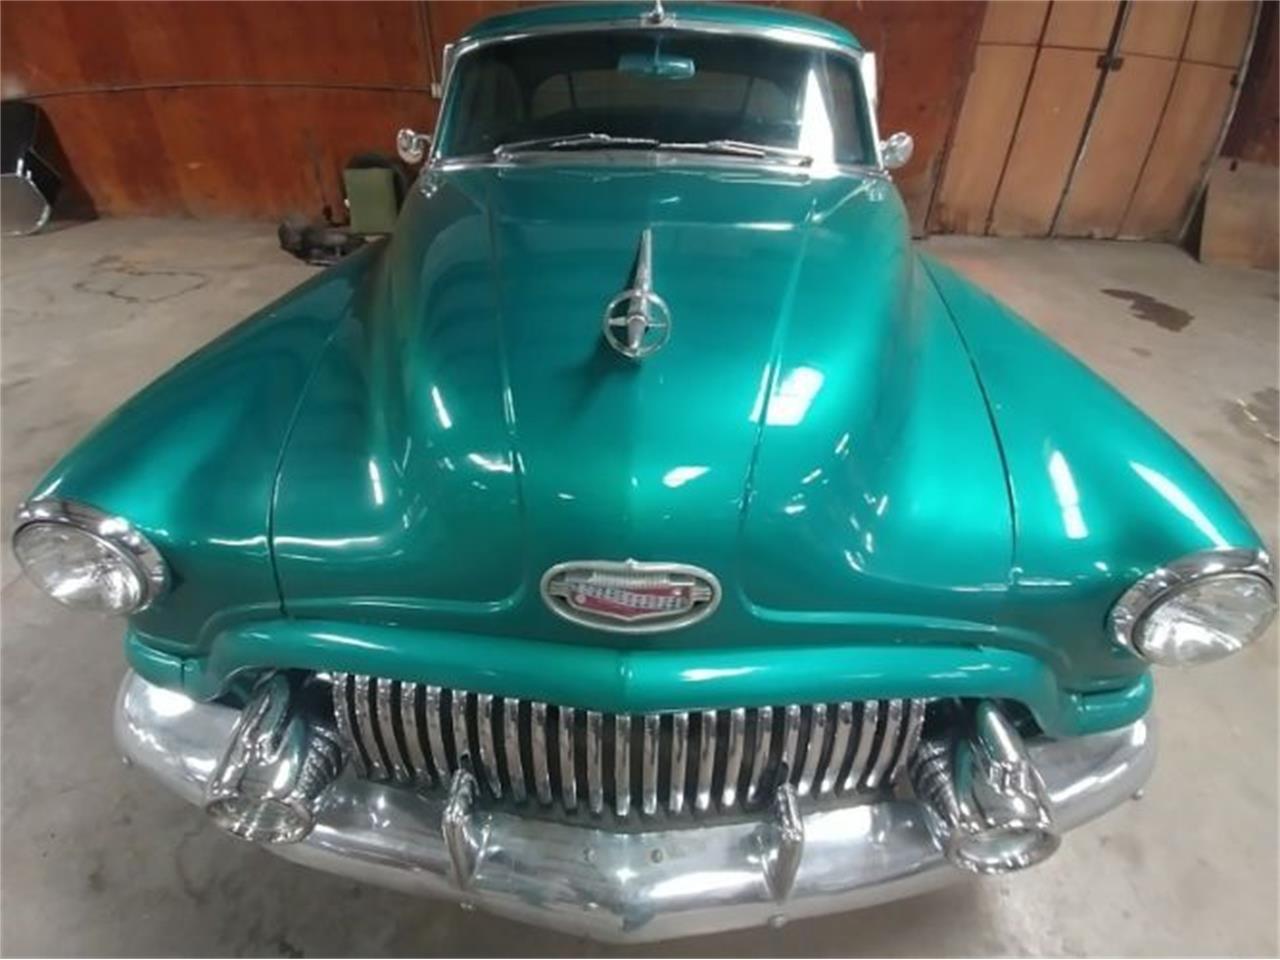 1951 Buick Riviera for sale in Cadillac, MI ...